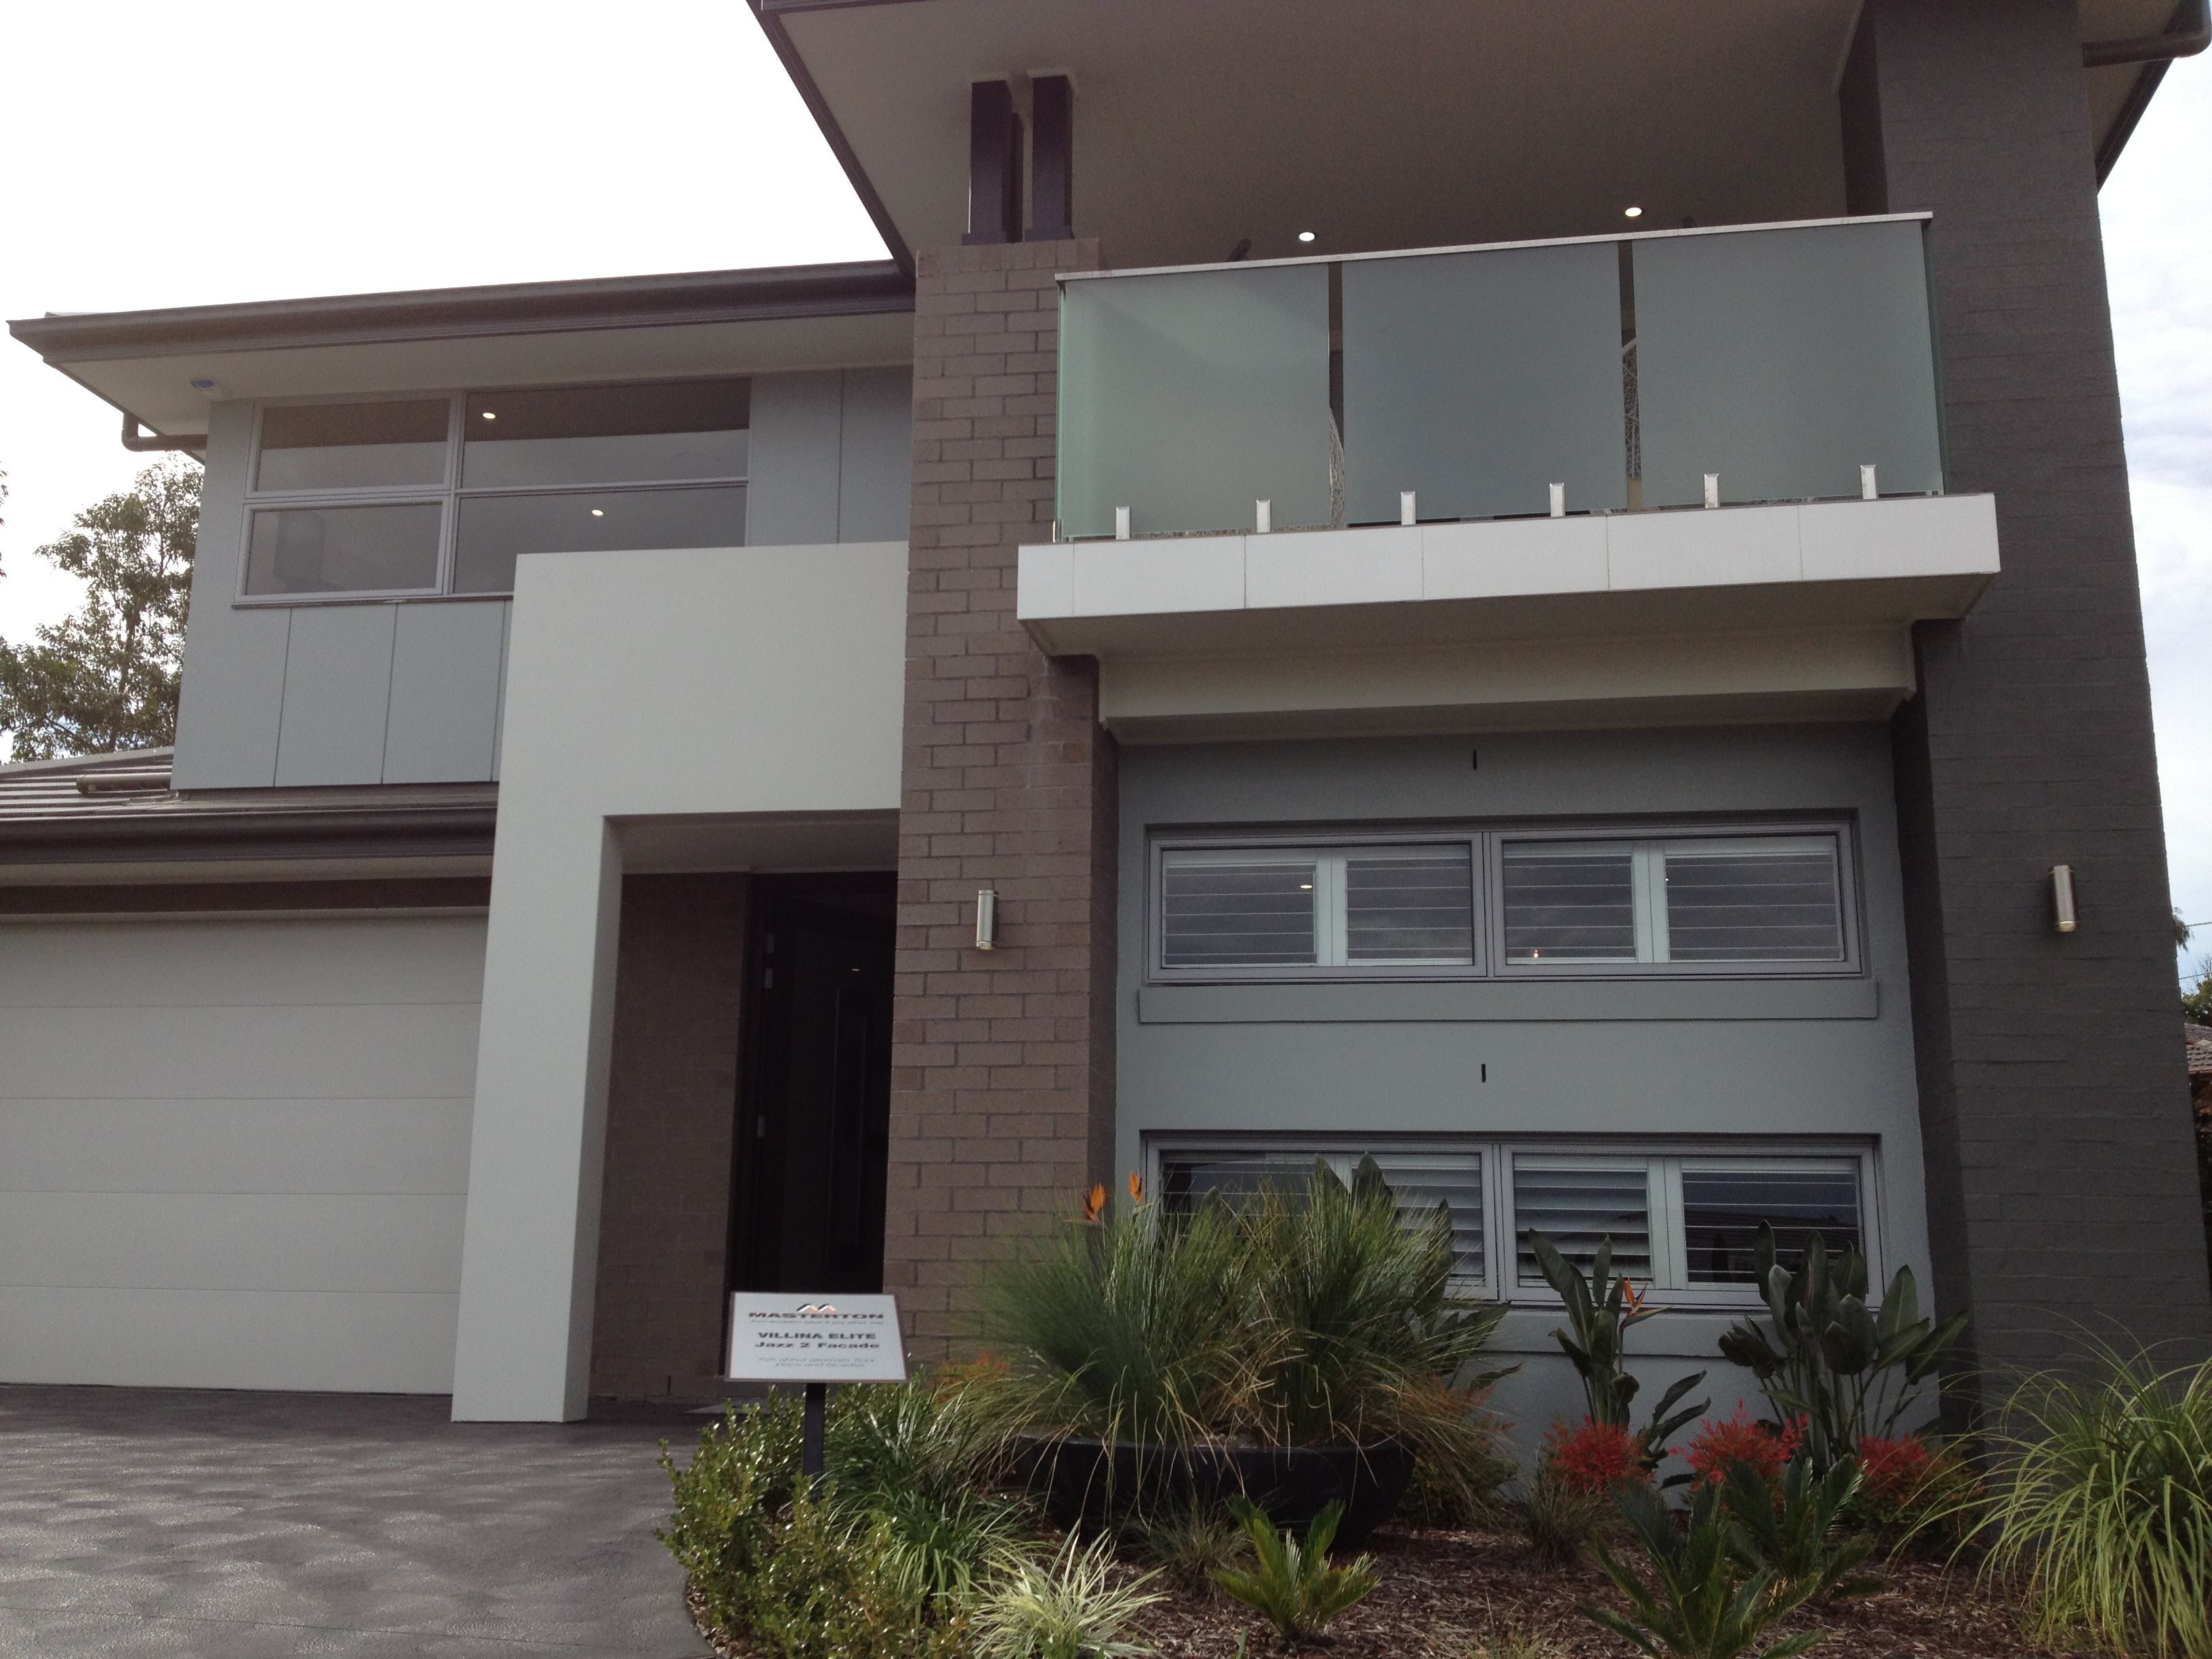 Masterton homes villina elite jazz 2 faced home designs for Masterton home designs